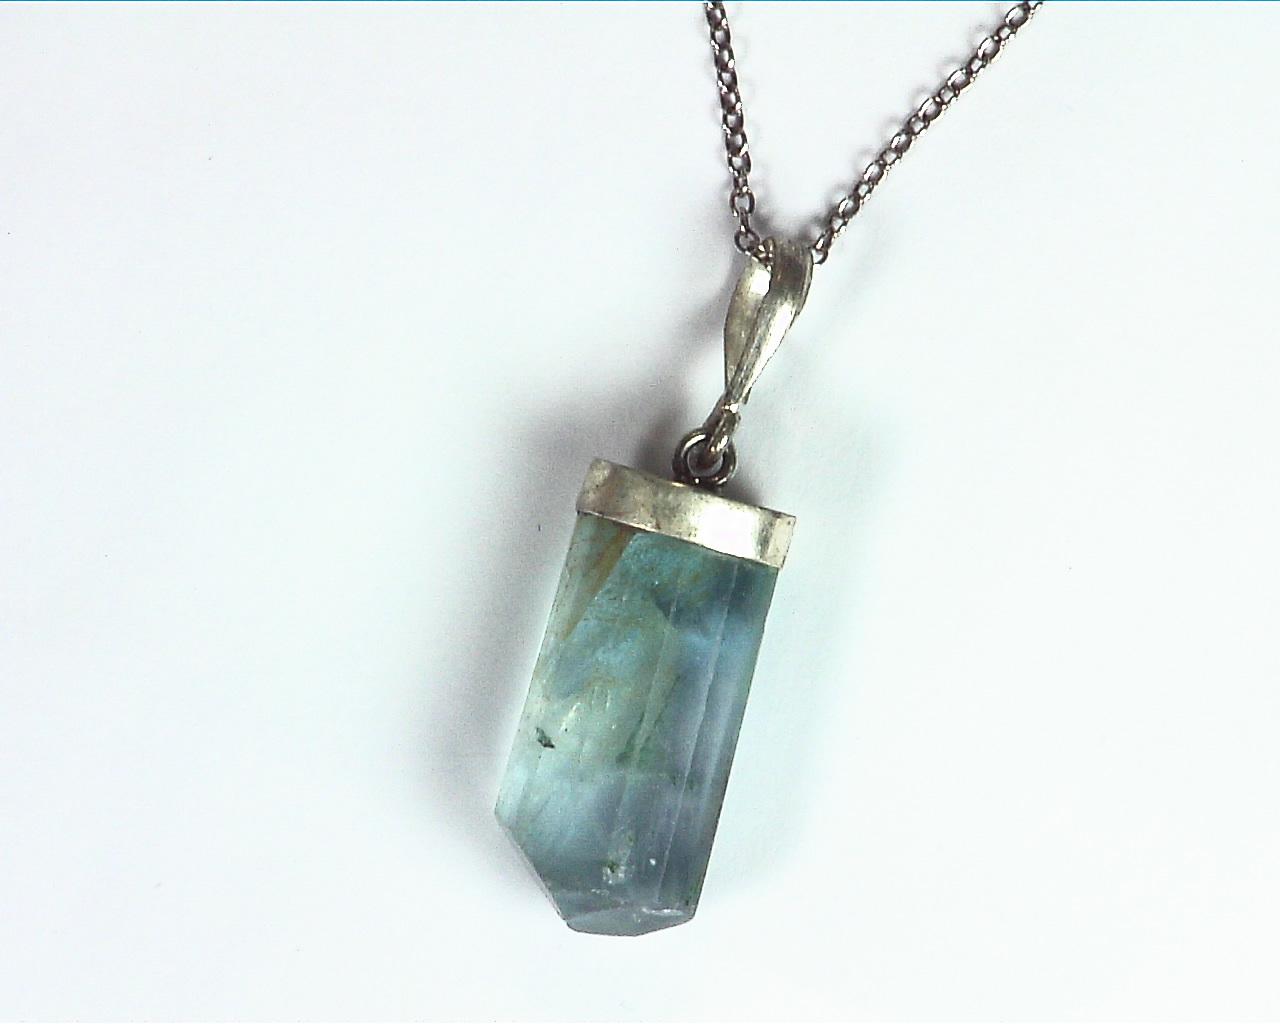 Fluorite Natural Genuine Gemstone Crystal Sterling Silver Pendent PSS,983 3